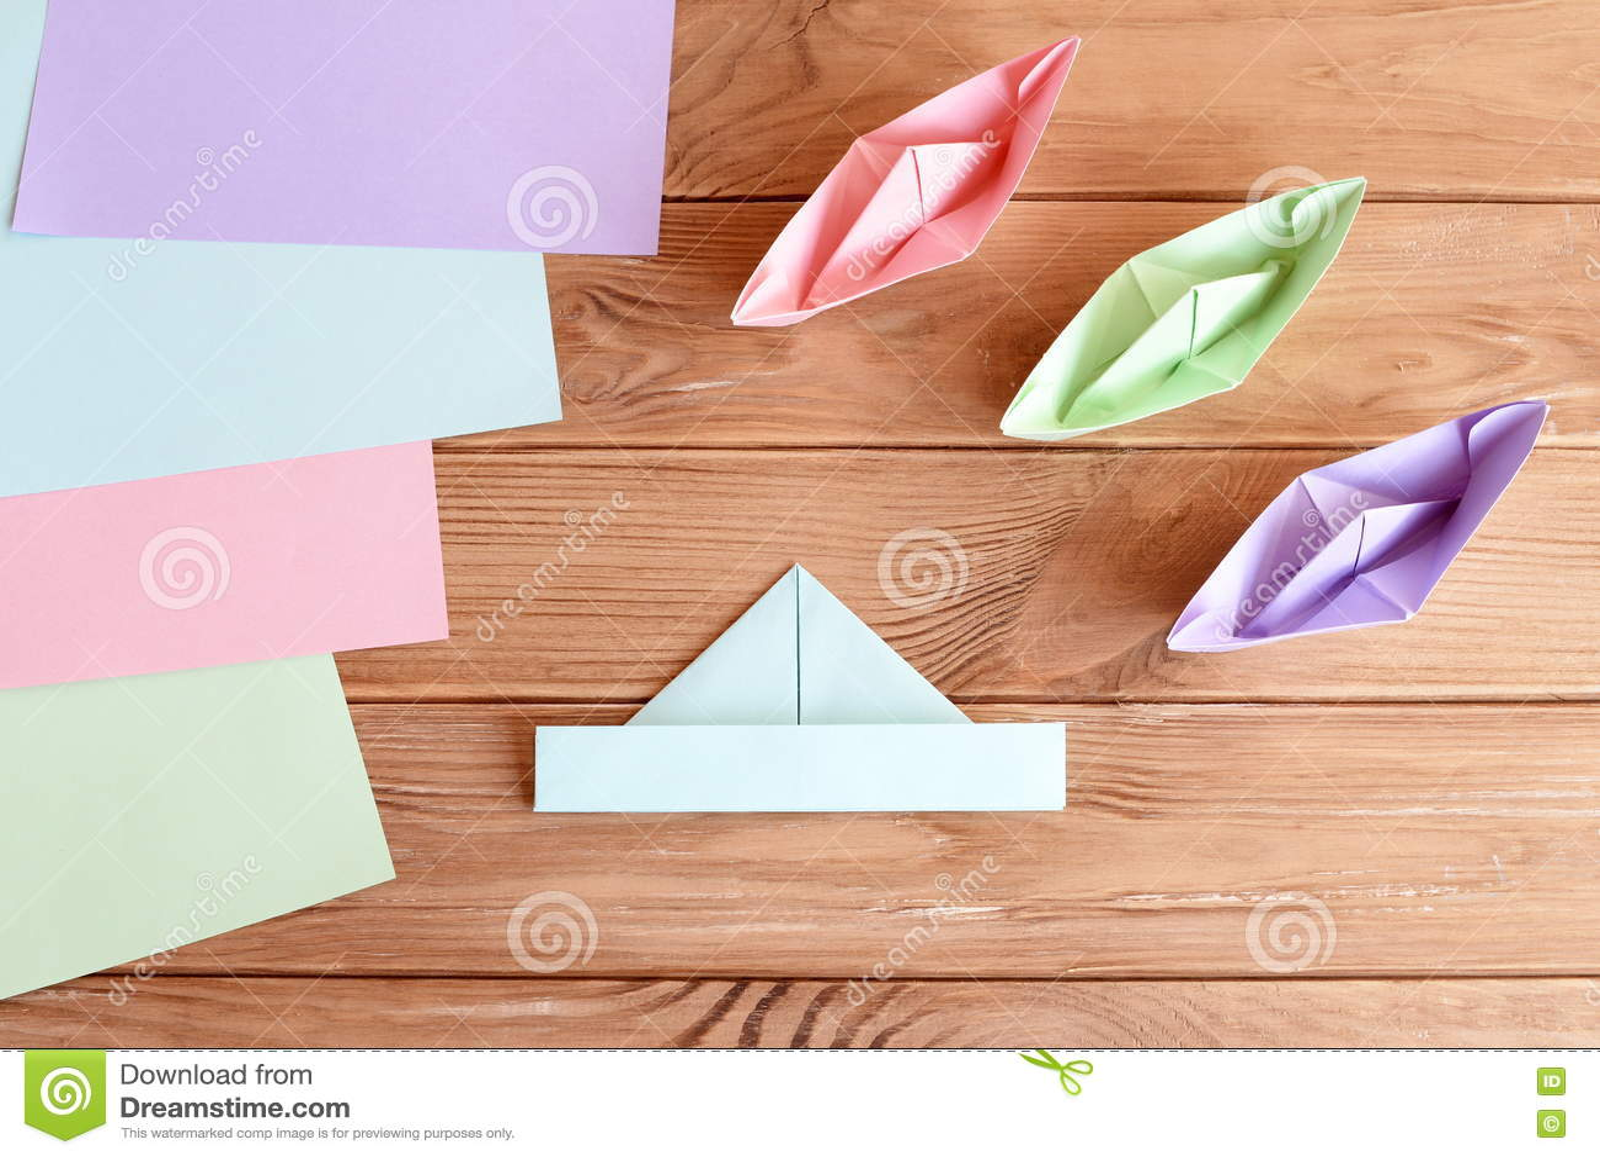 Sail Boat Origami | Origami boat, Origami boat instructions ... | 957x1300